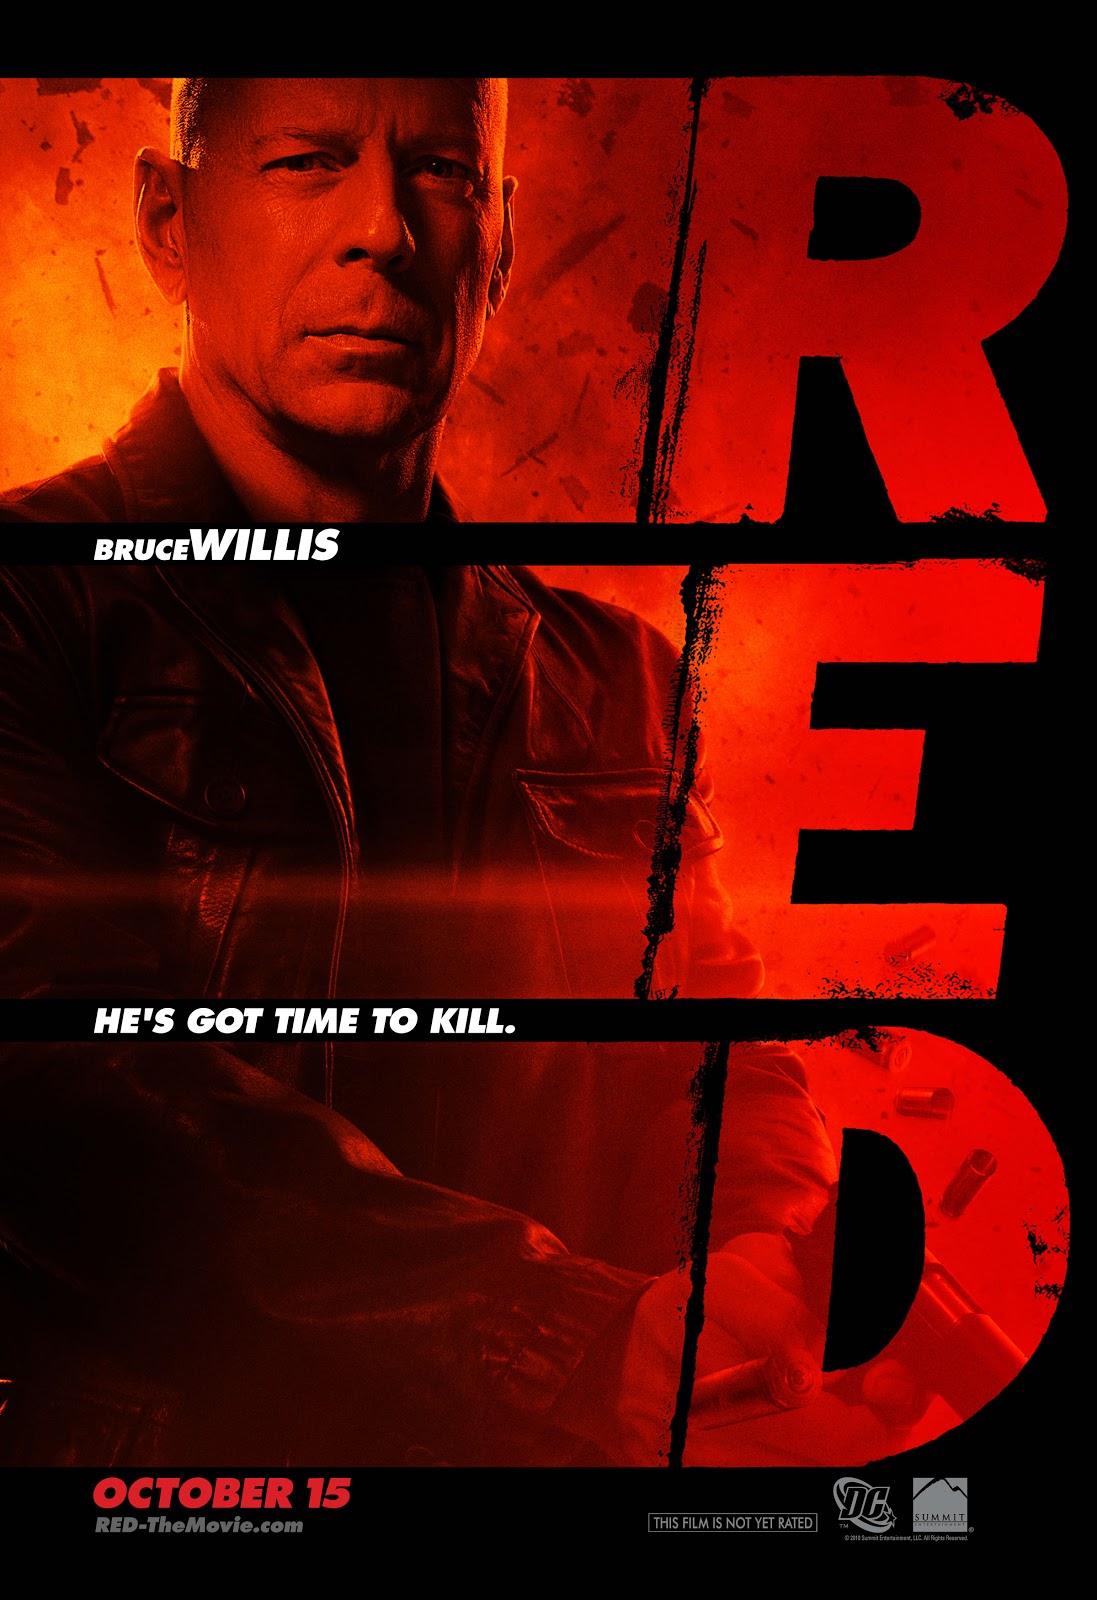 http://4.bp.blogspot.com/_fKlalOPqw3Y/TMEeq5gVQMI/AAAAAAAABgg/8ZJDkf0QuNE/s1600/red-poster-bruce-willis.jpg